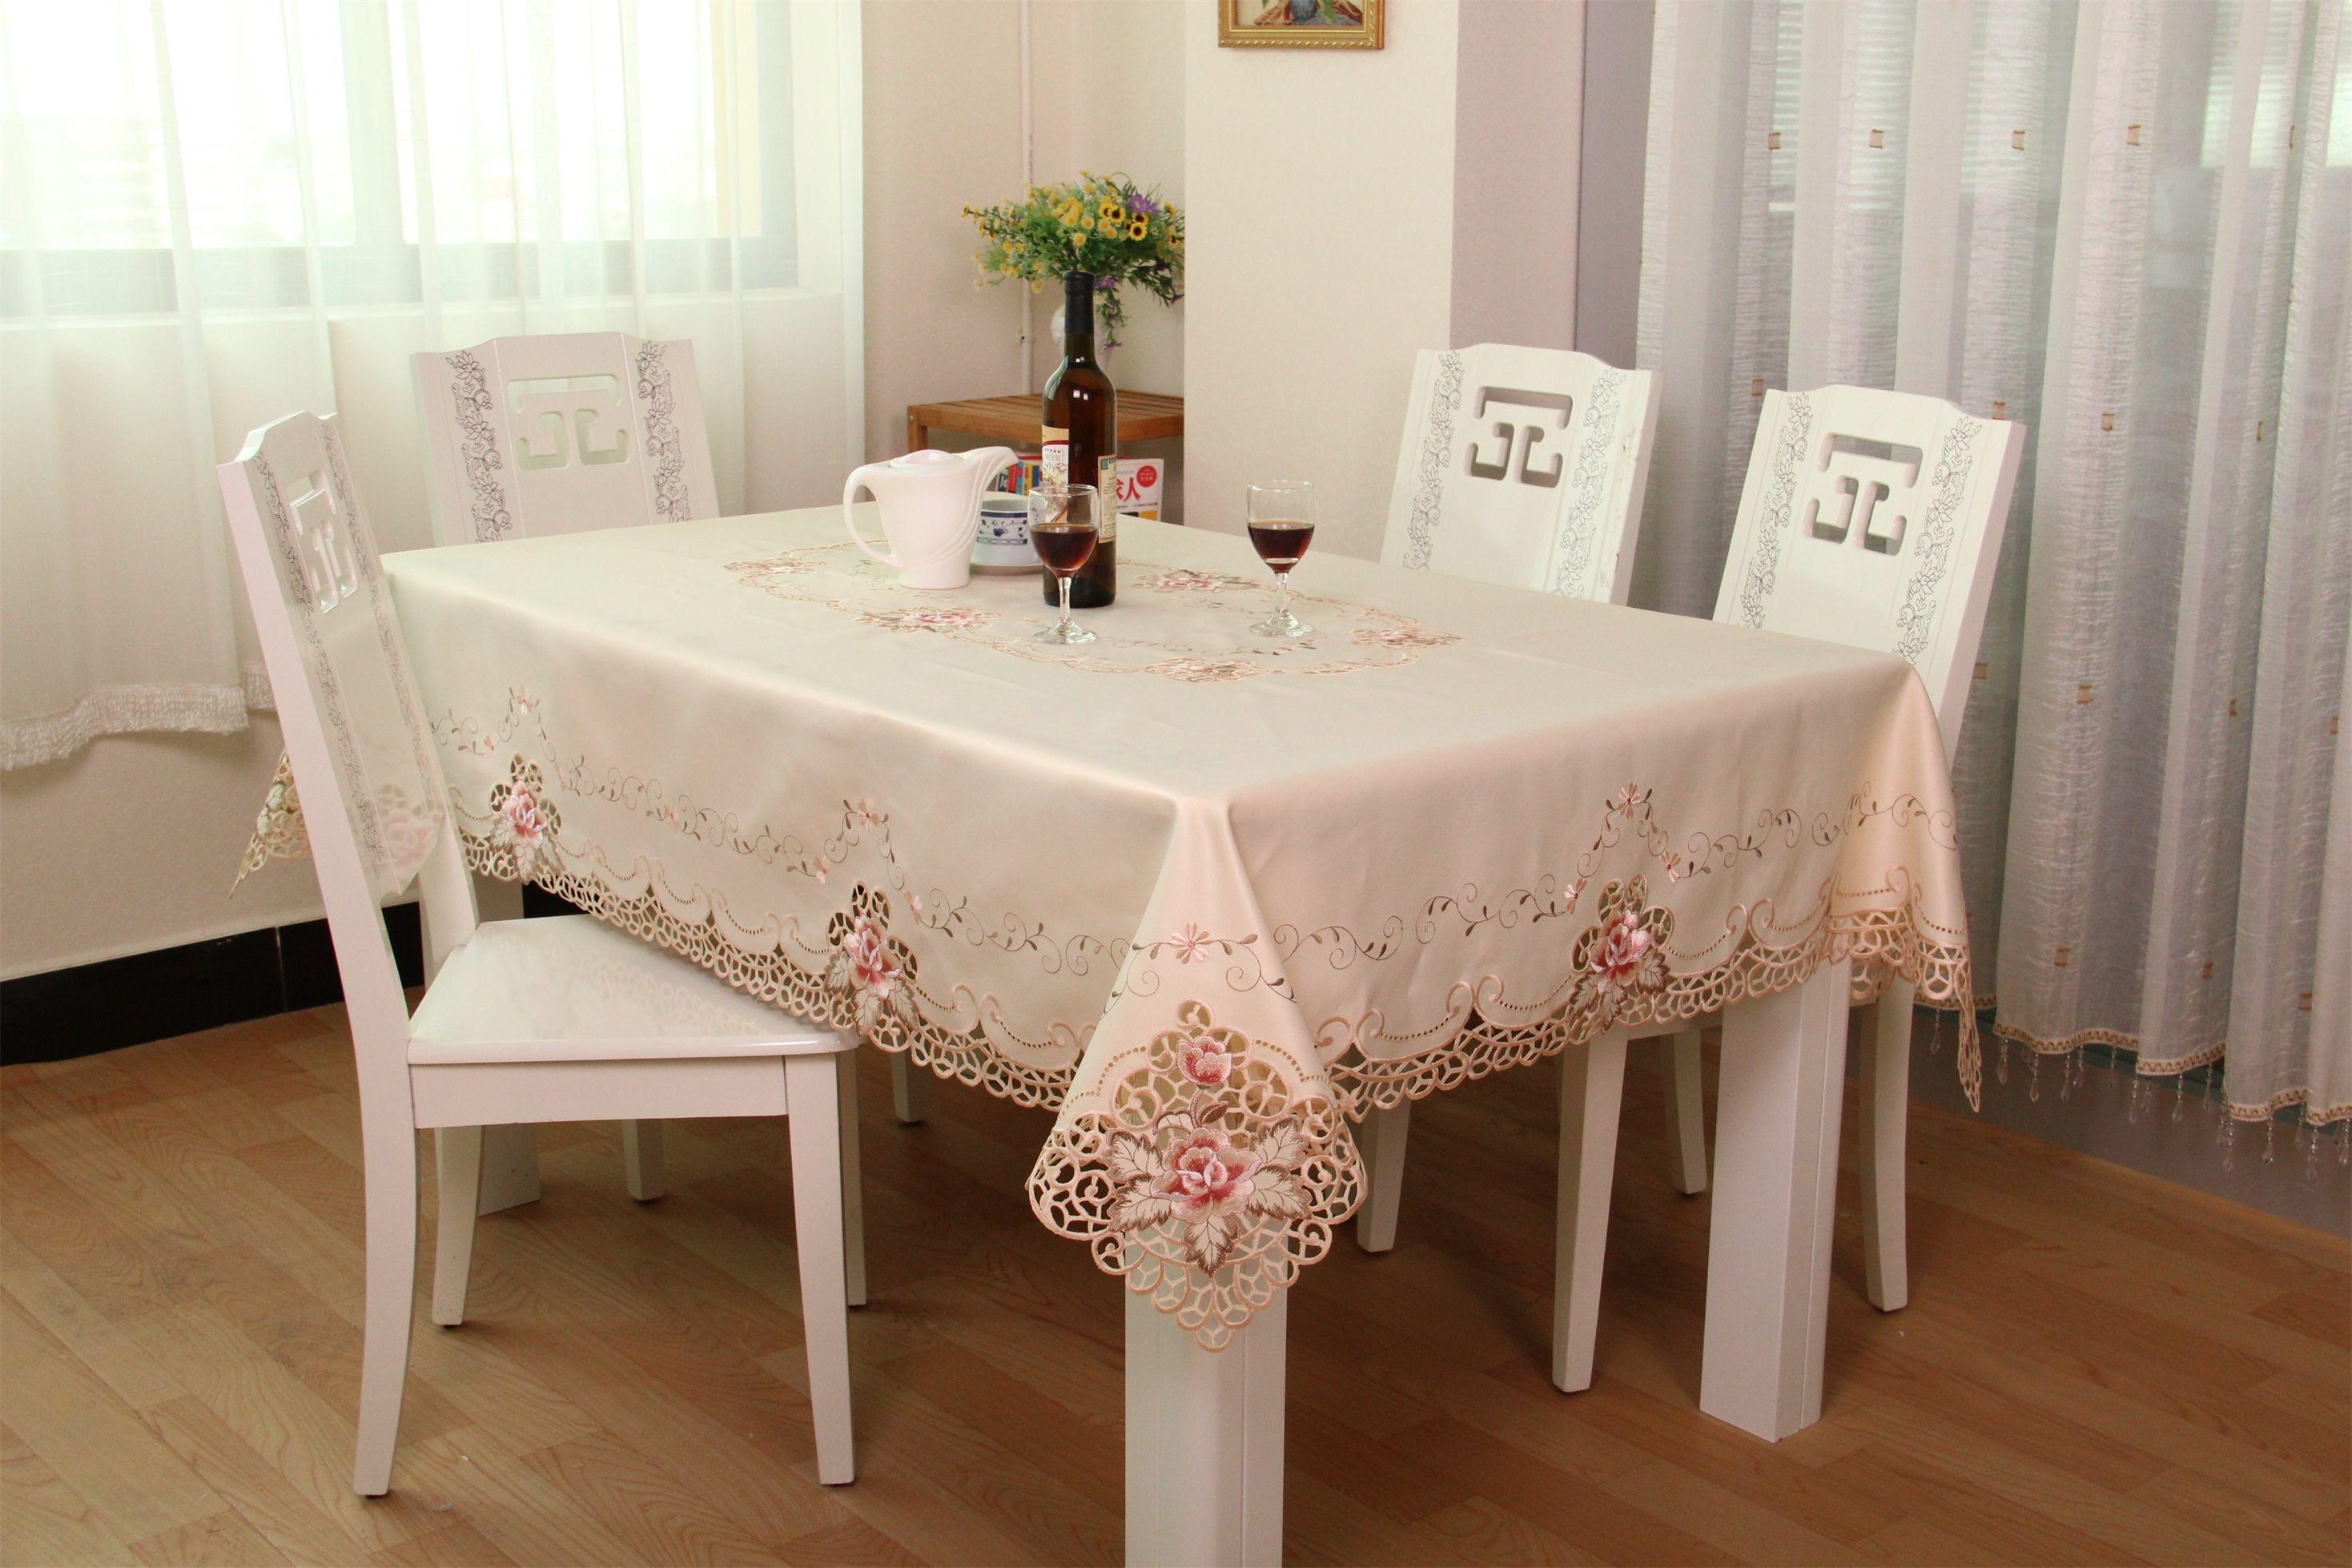 ... Retangular Embroidered Tablecloth High Quality Handmade Table Cover  White Round Tablecloth Toalha De Mesa Retangular Tablecloths For Weddings Linen  Like ...